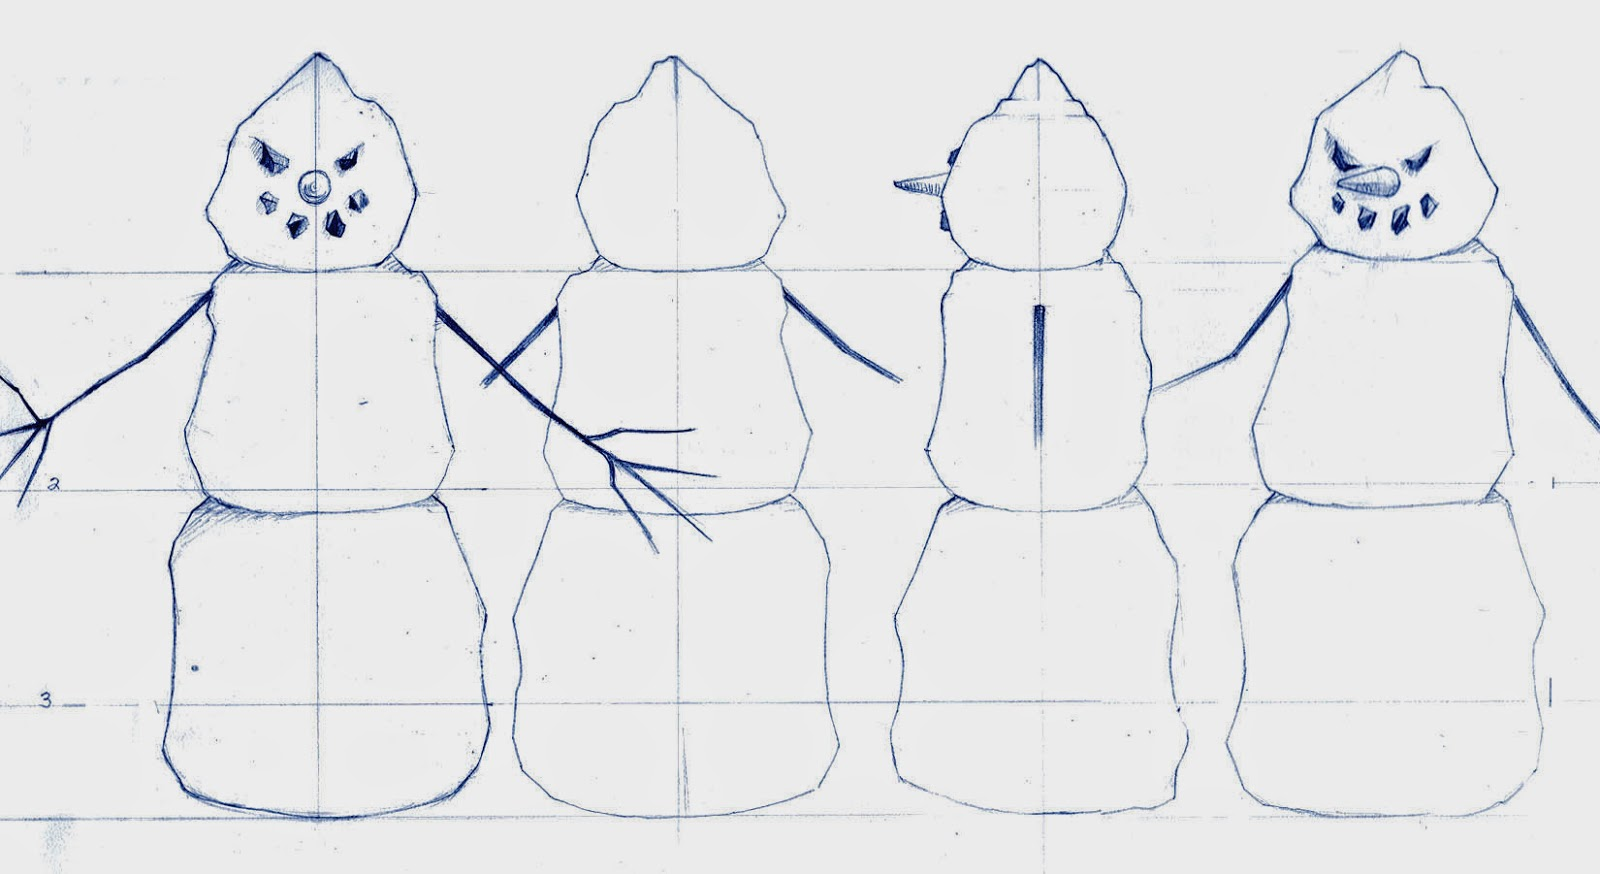 Snowman Amuck